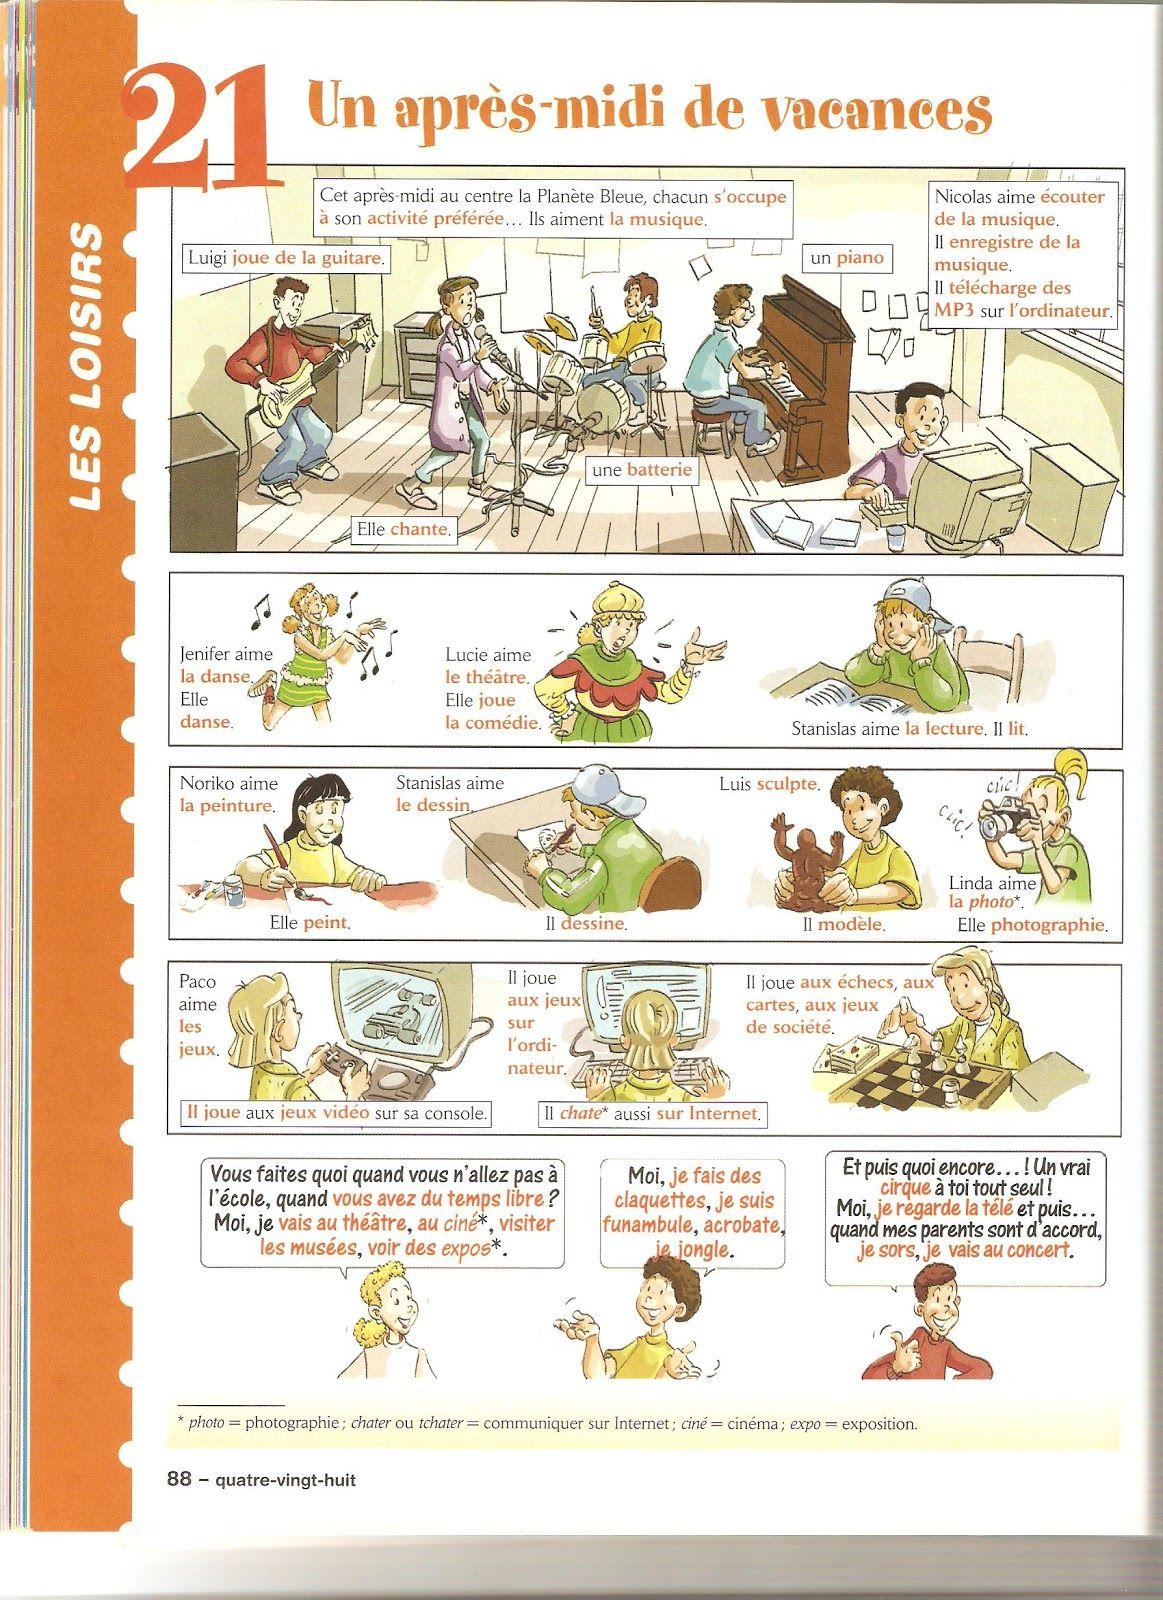 Les Loisirs Language